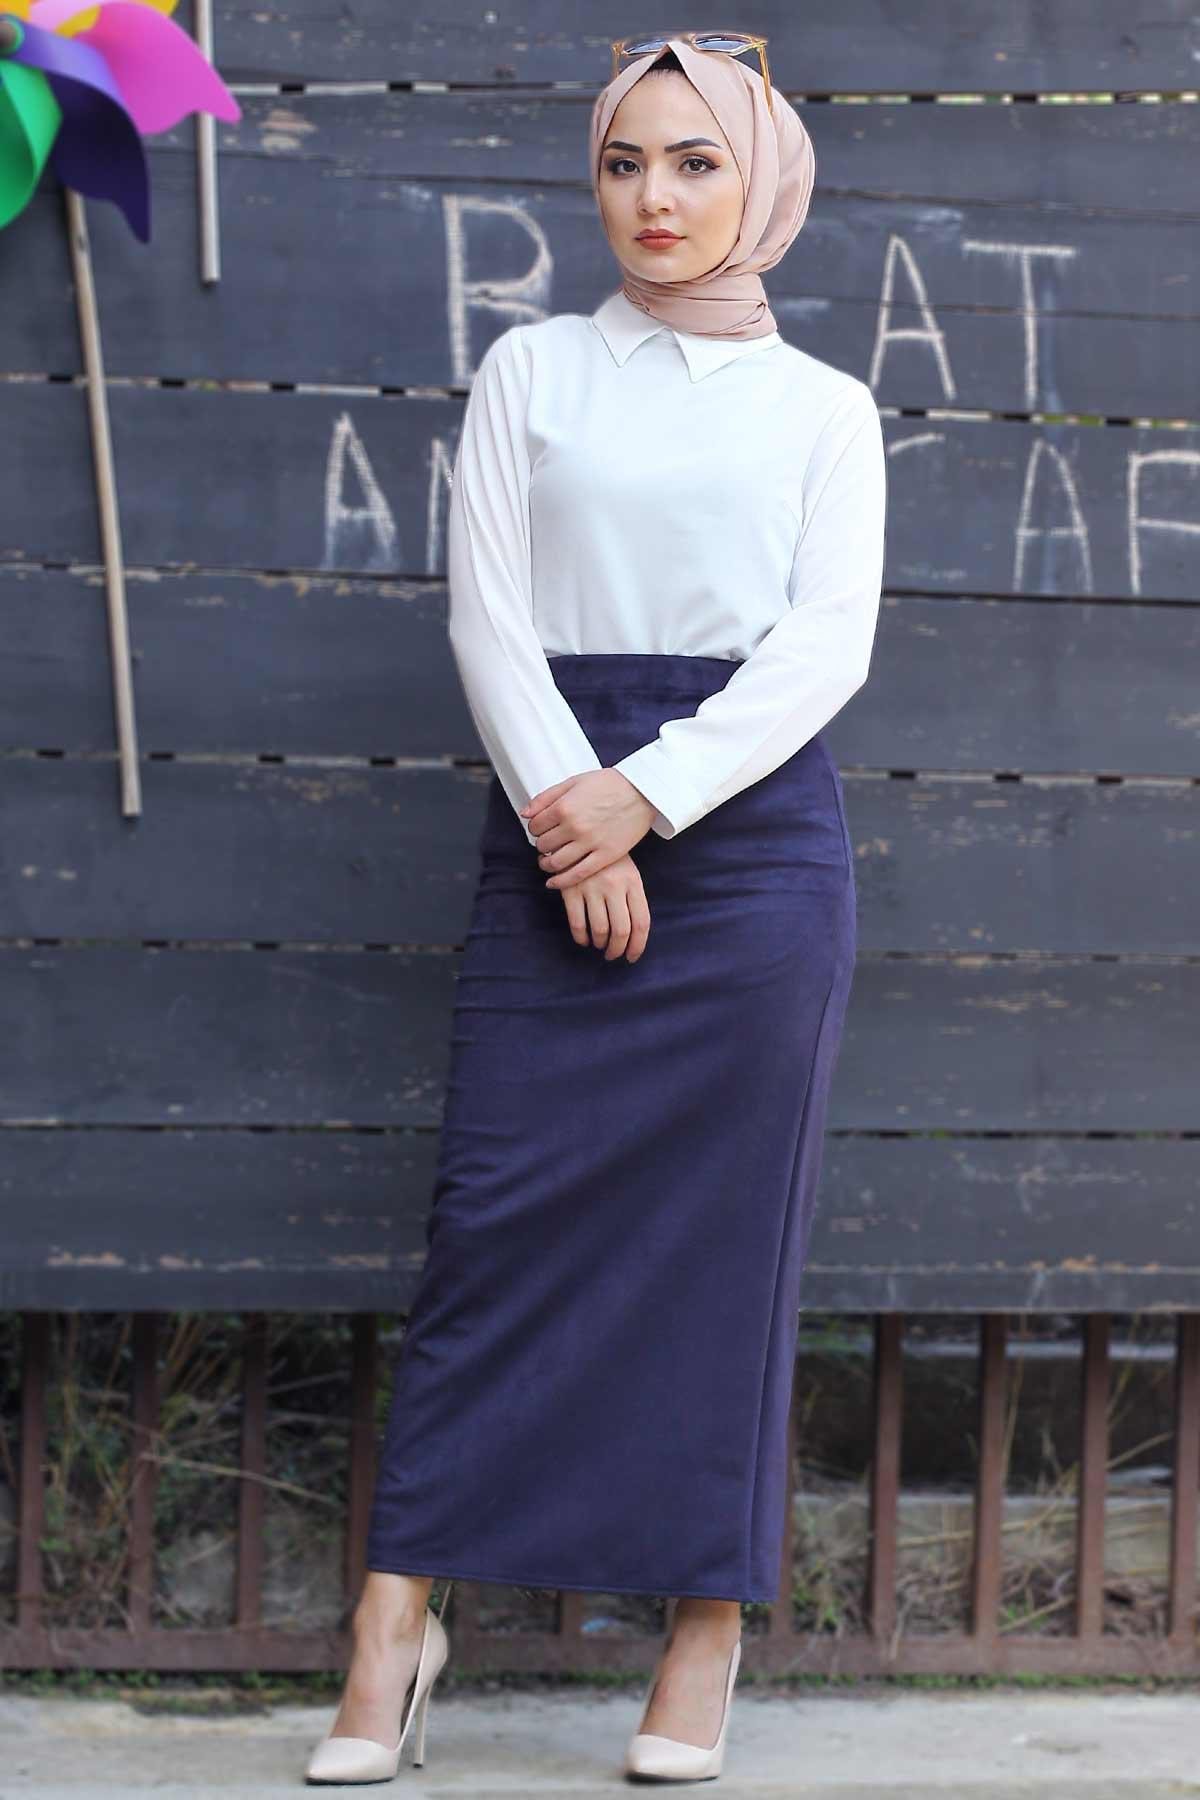 Suede Skirt TSD1745 Navy Blue